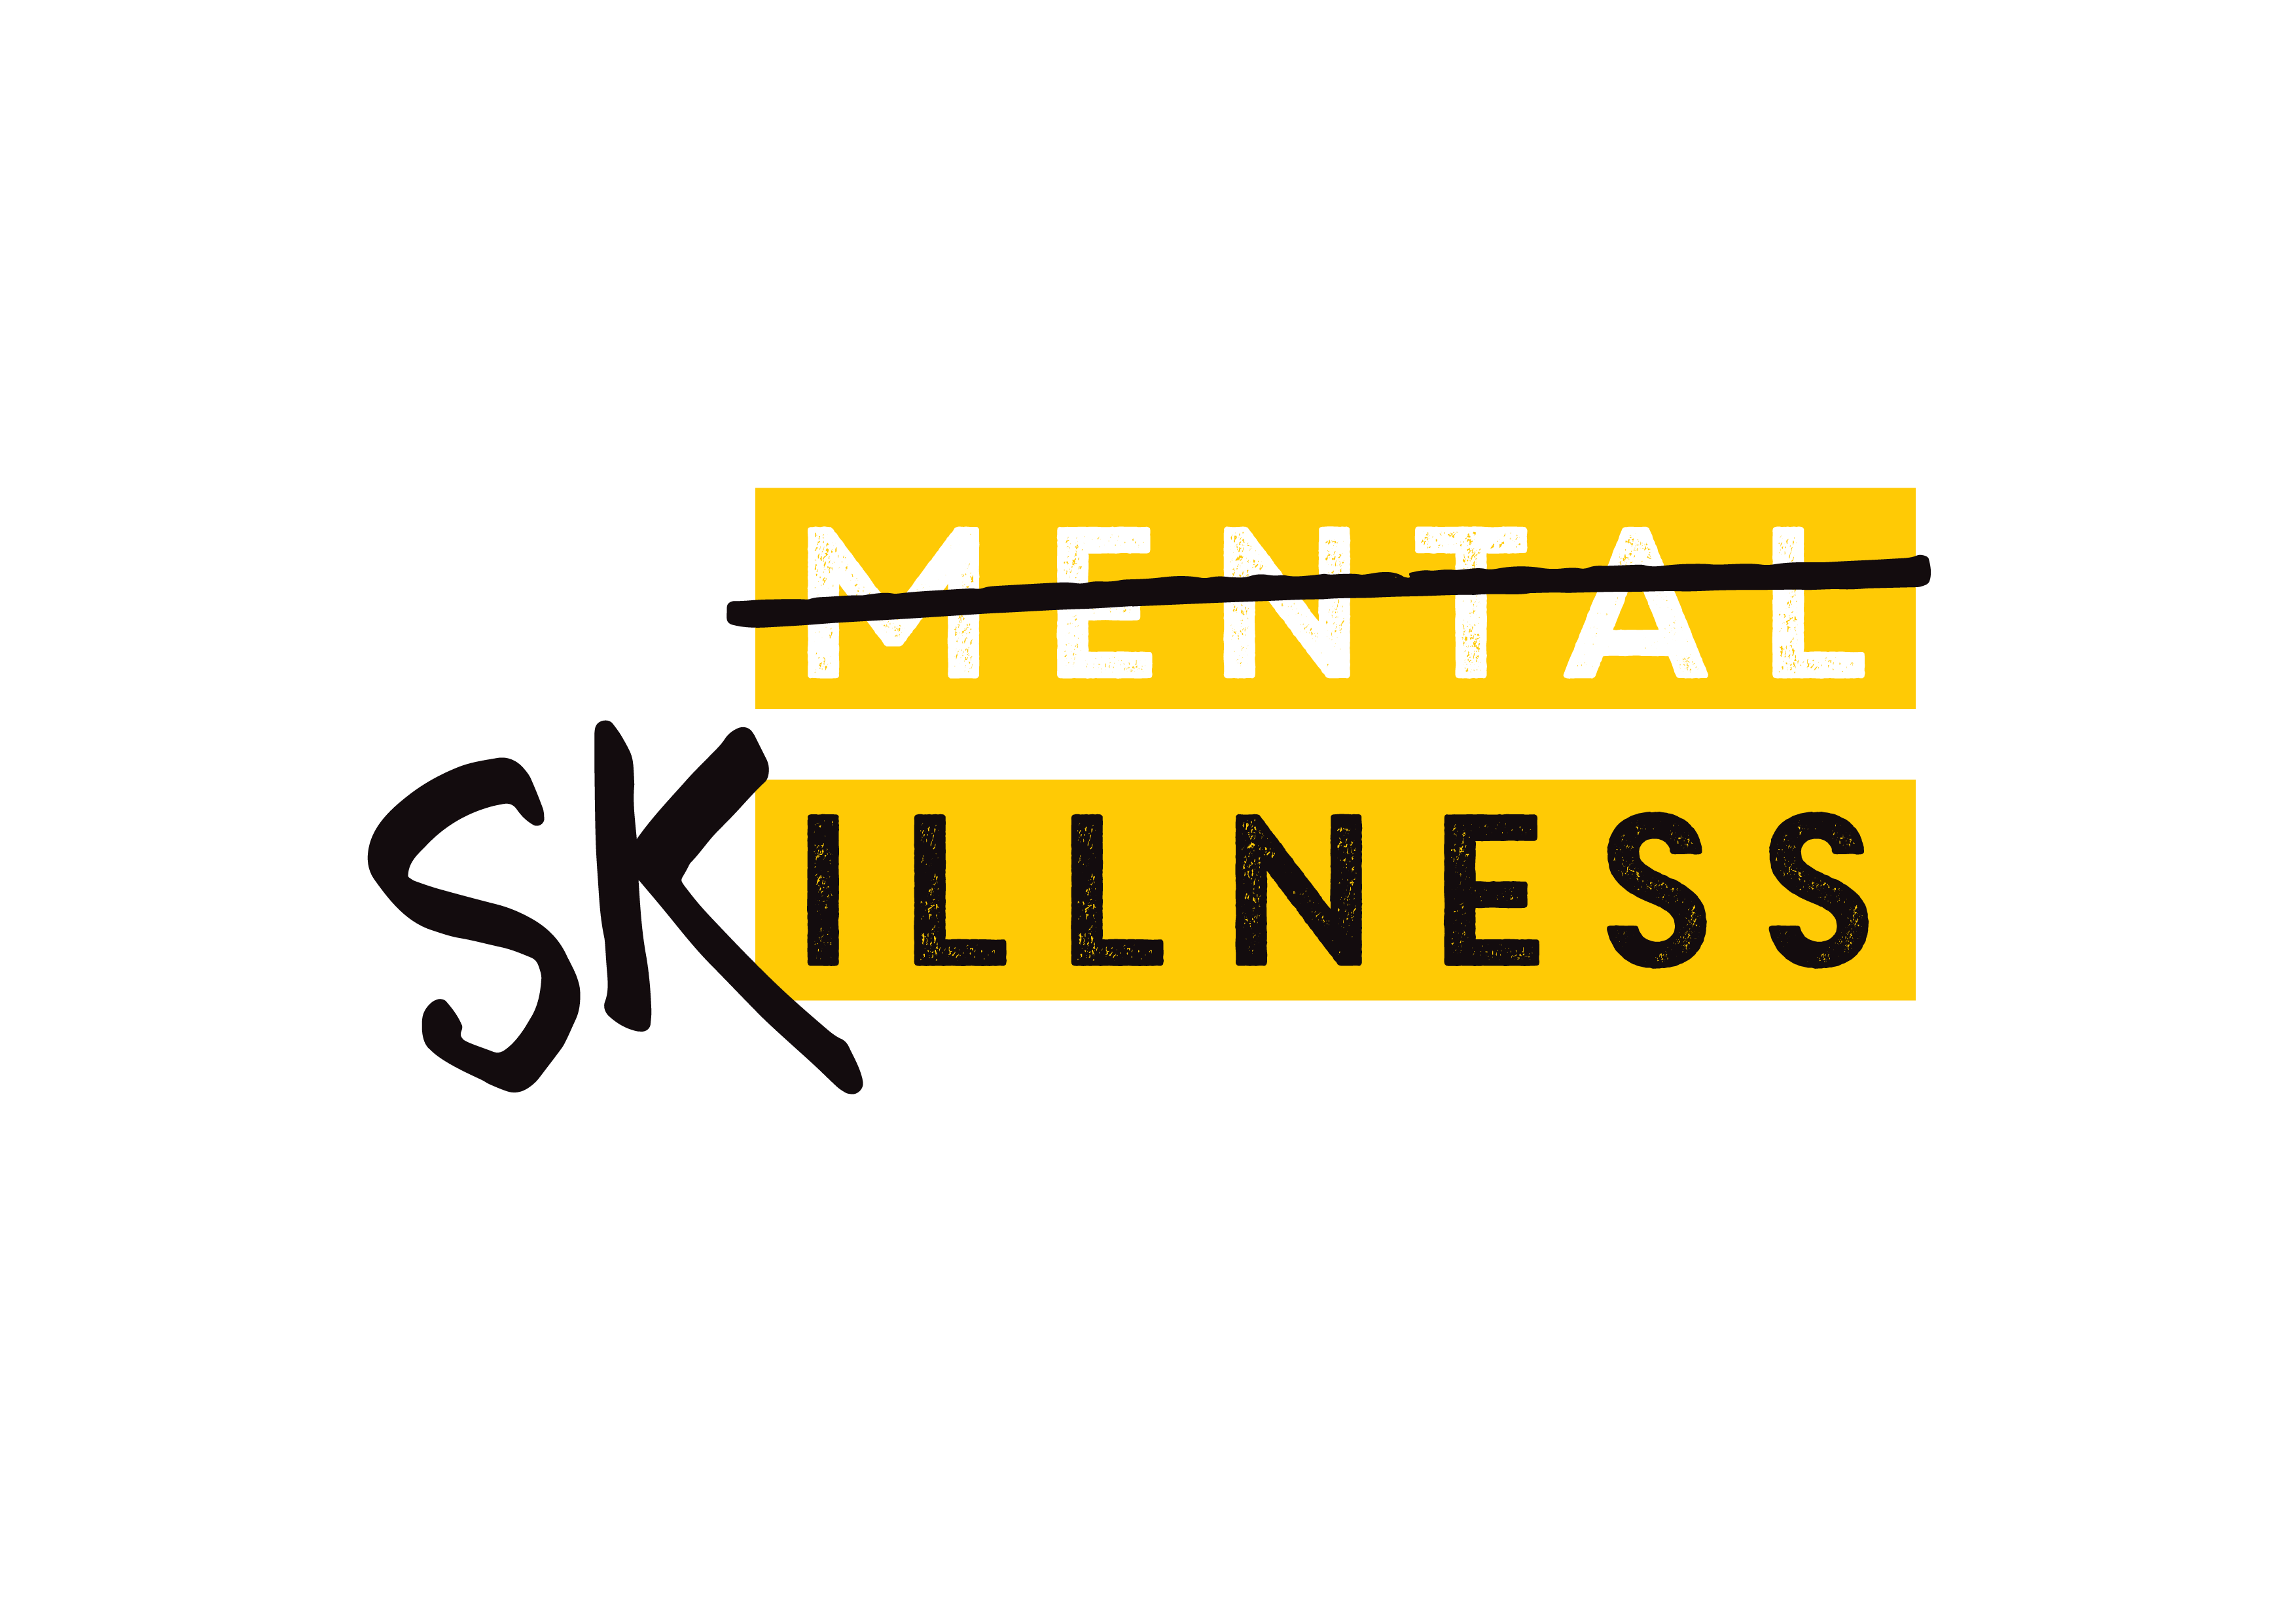 SKillness Plus Social